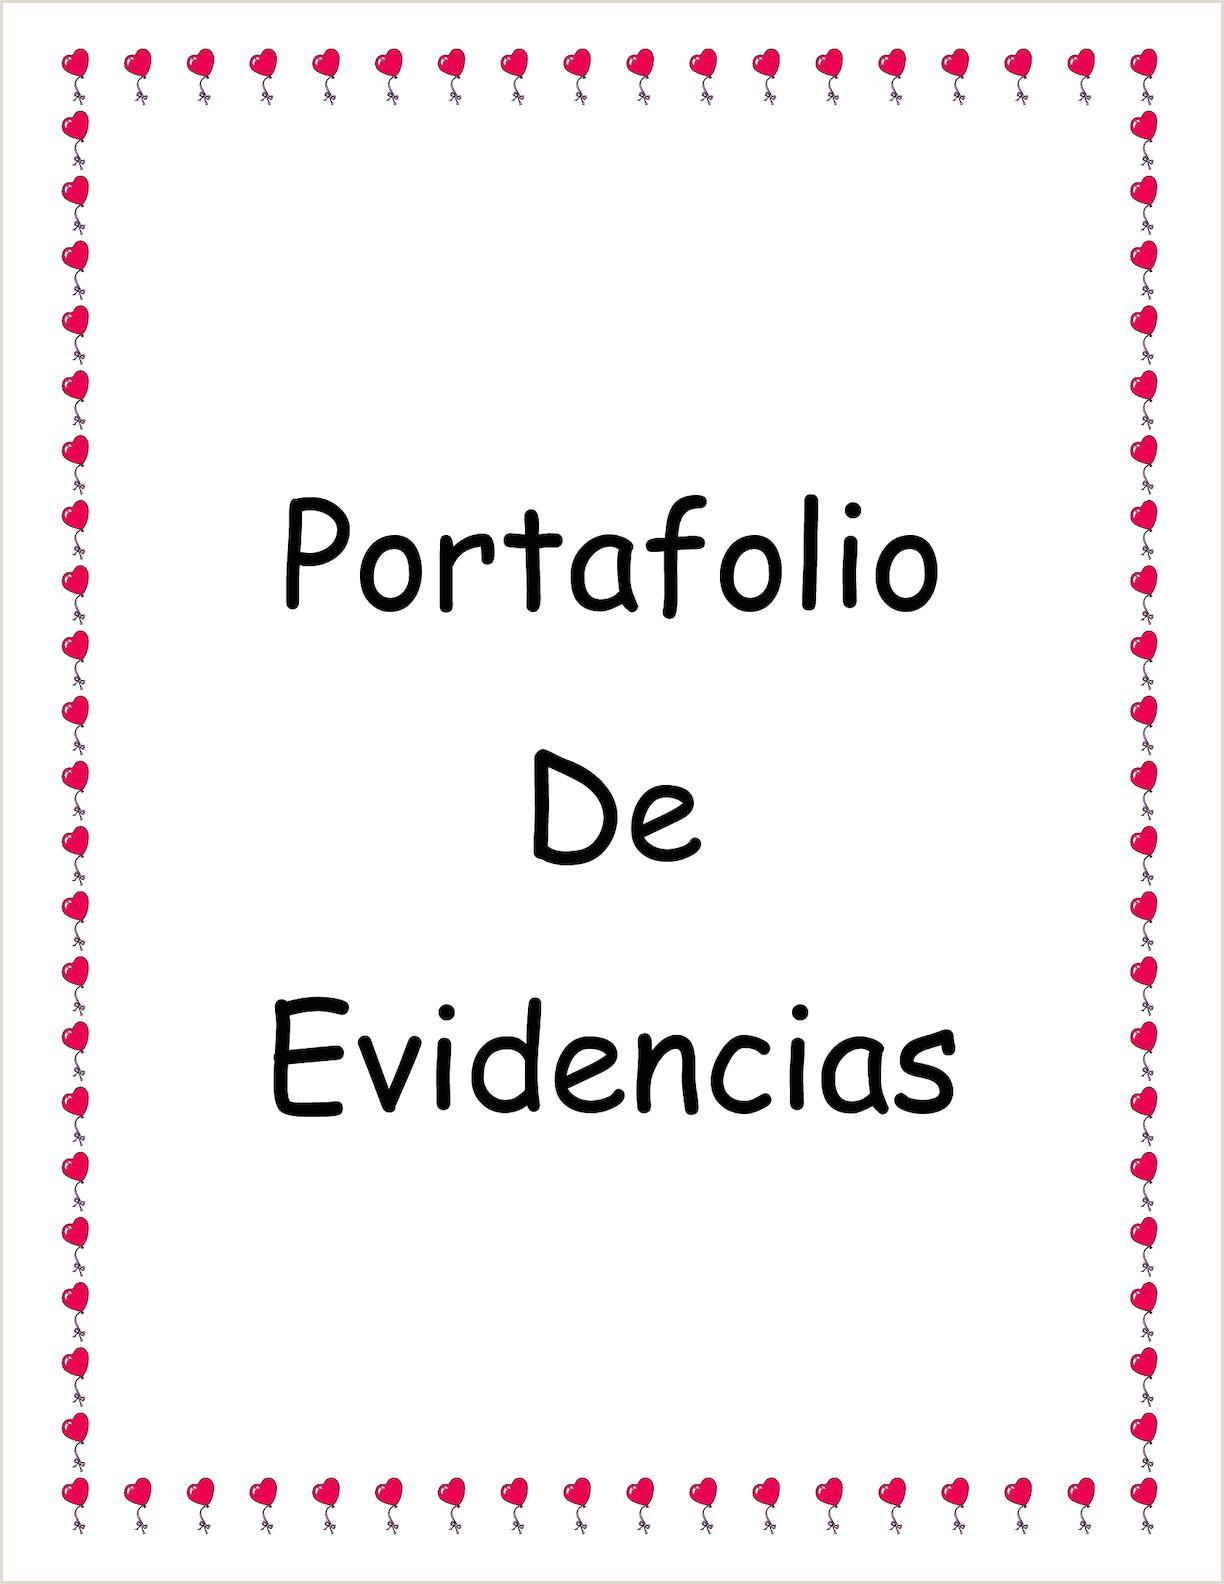 Formato Unico De Hoja De Vida Mineducacion Calaméo Portafolio 1 1